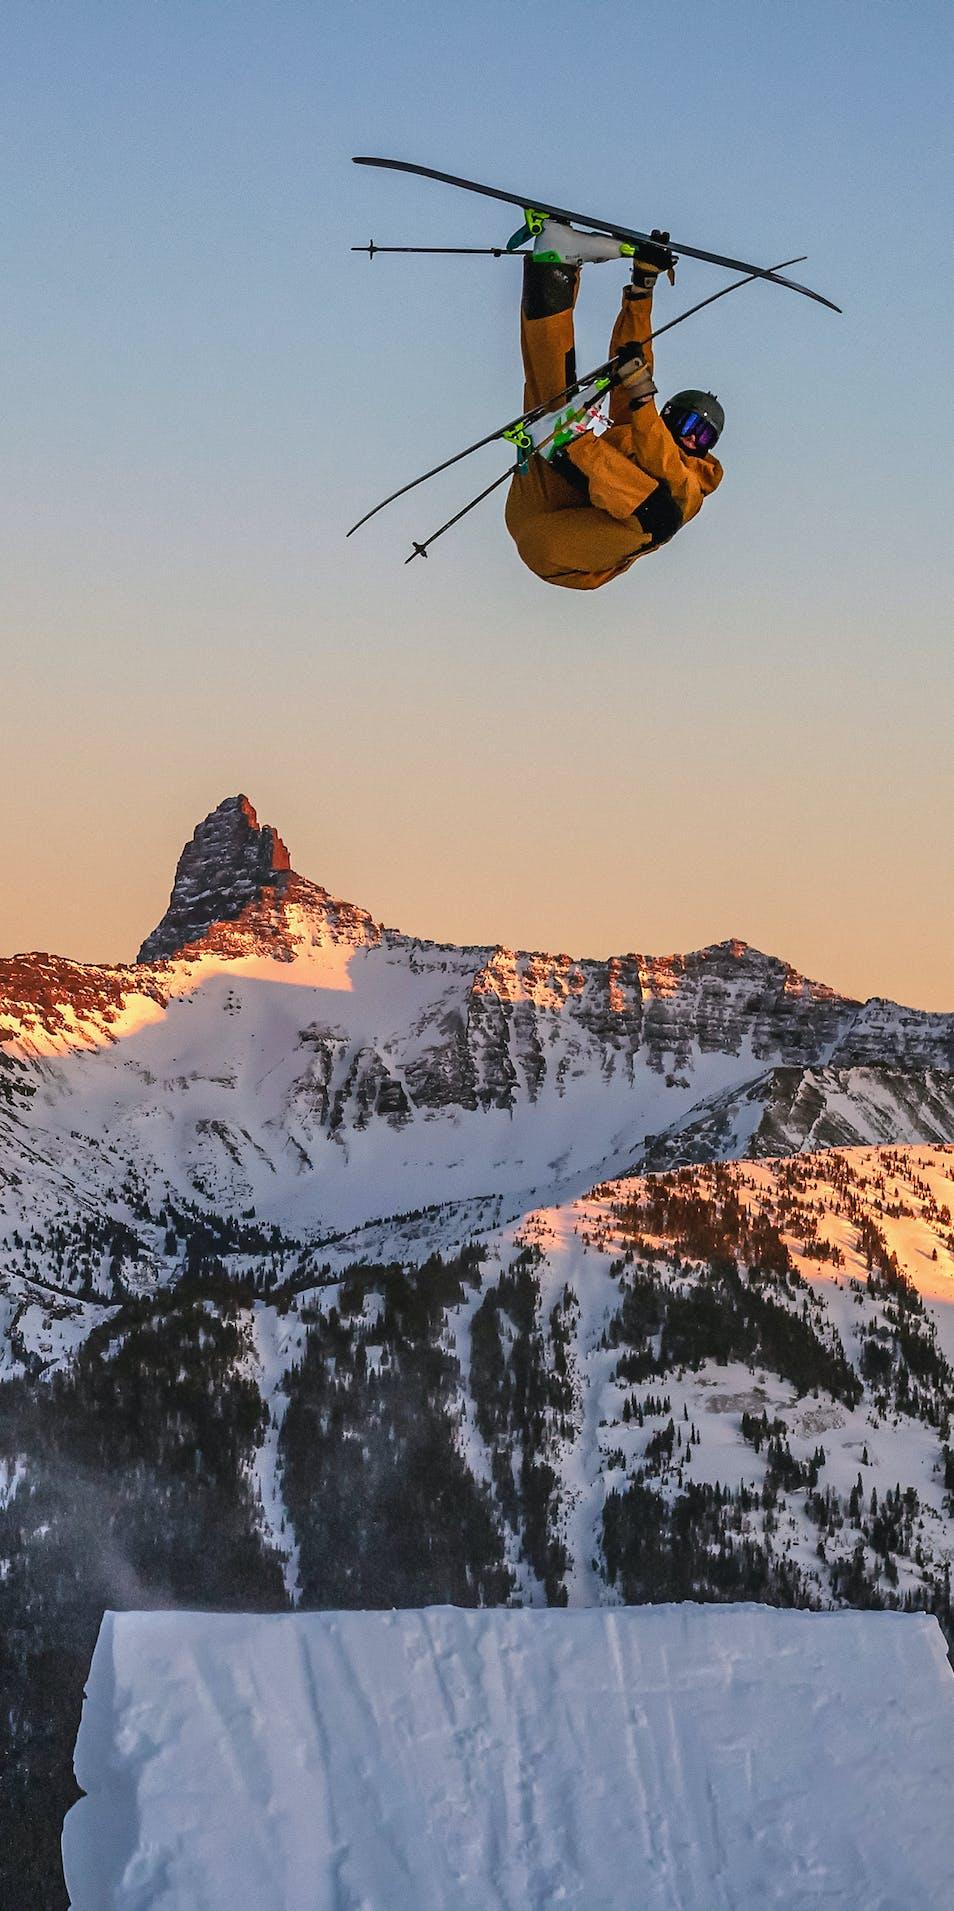 Black Diamond Athlete Parkin Costain hitting a ski jump in the backcountry